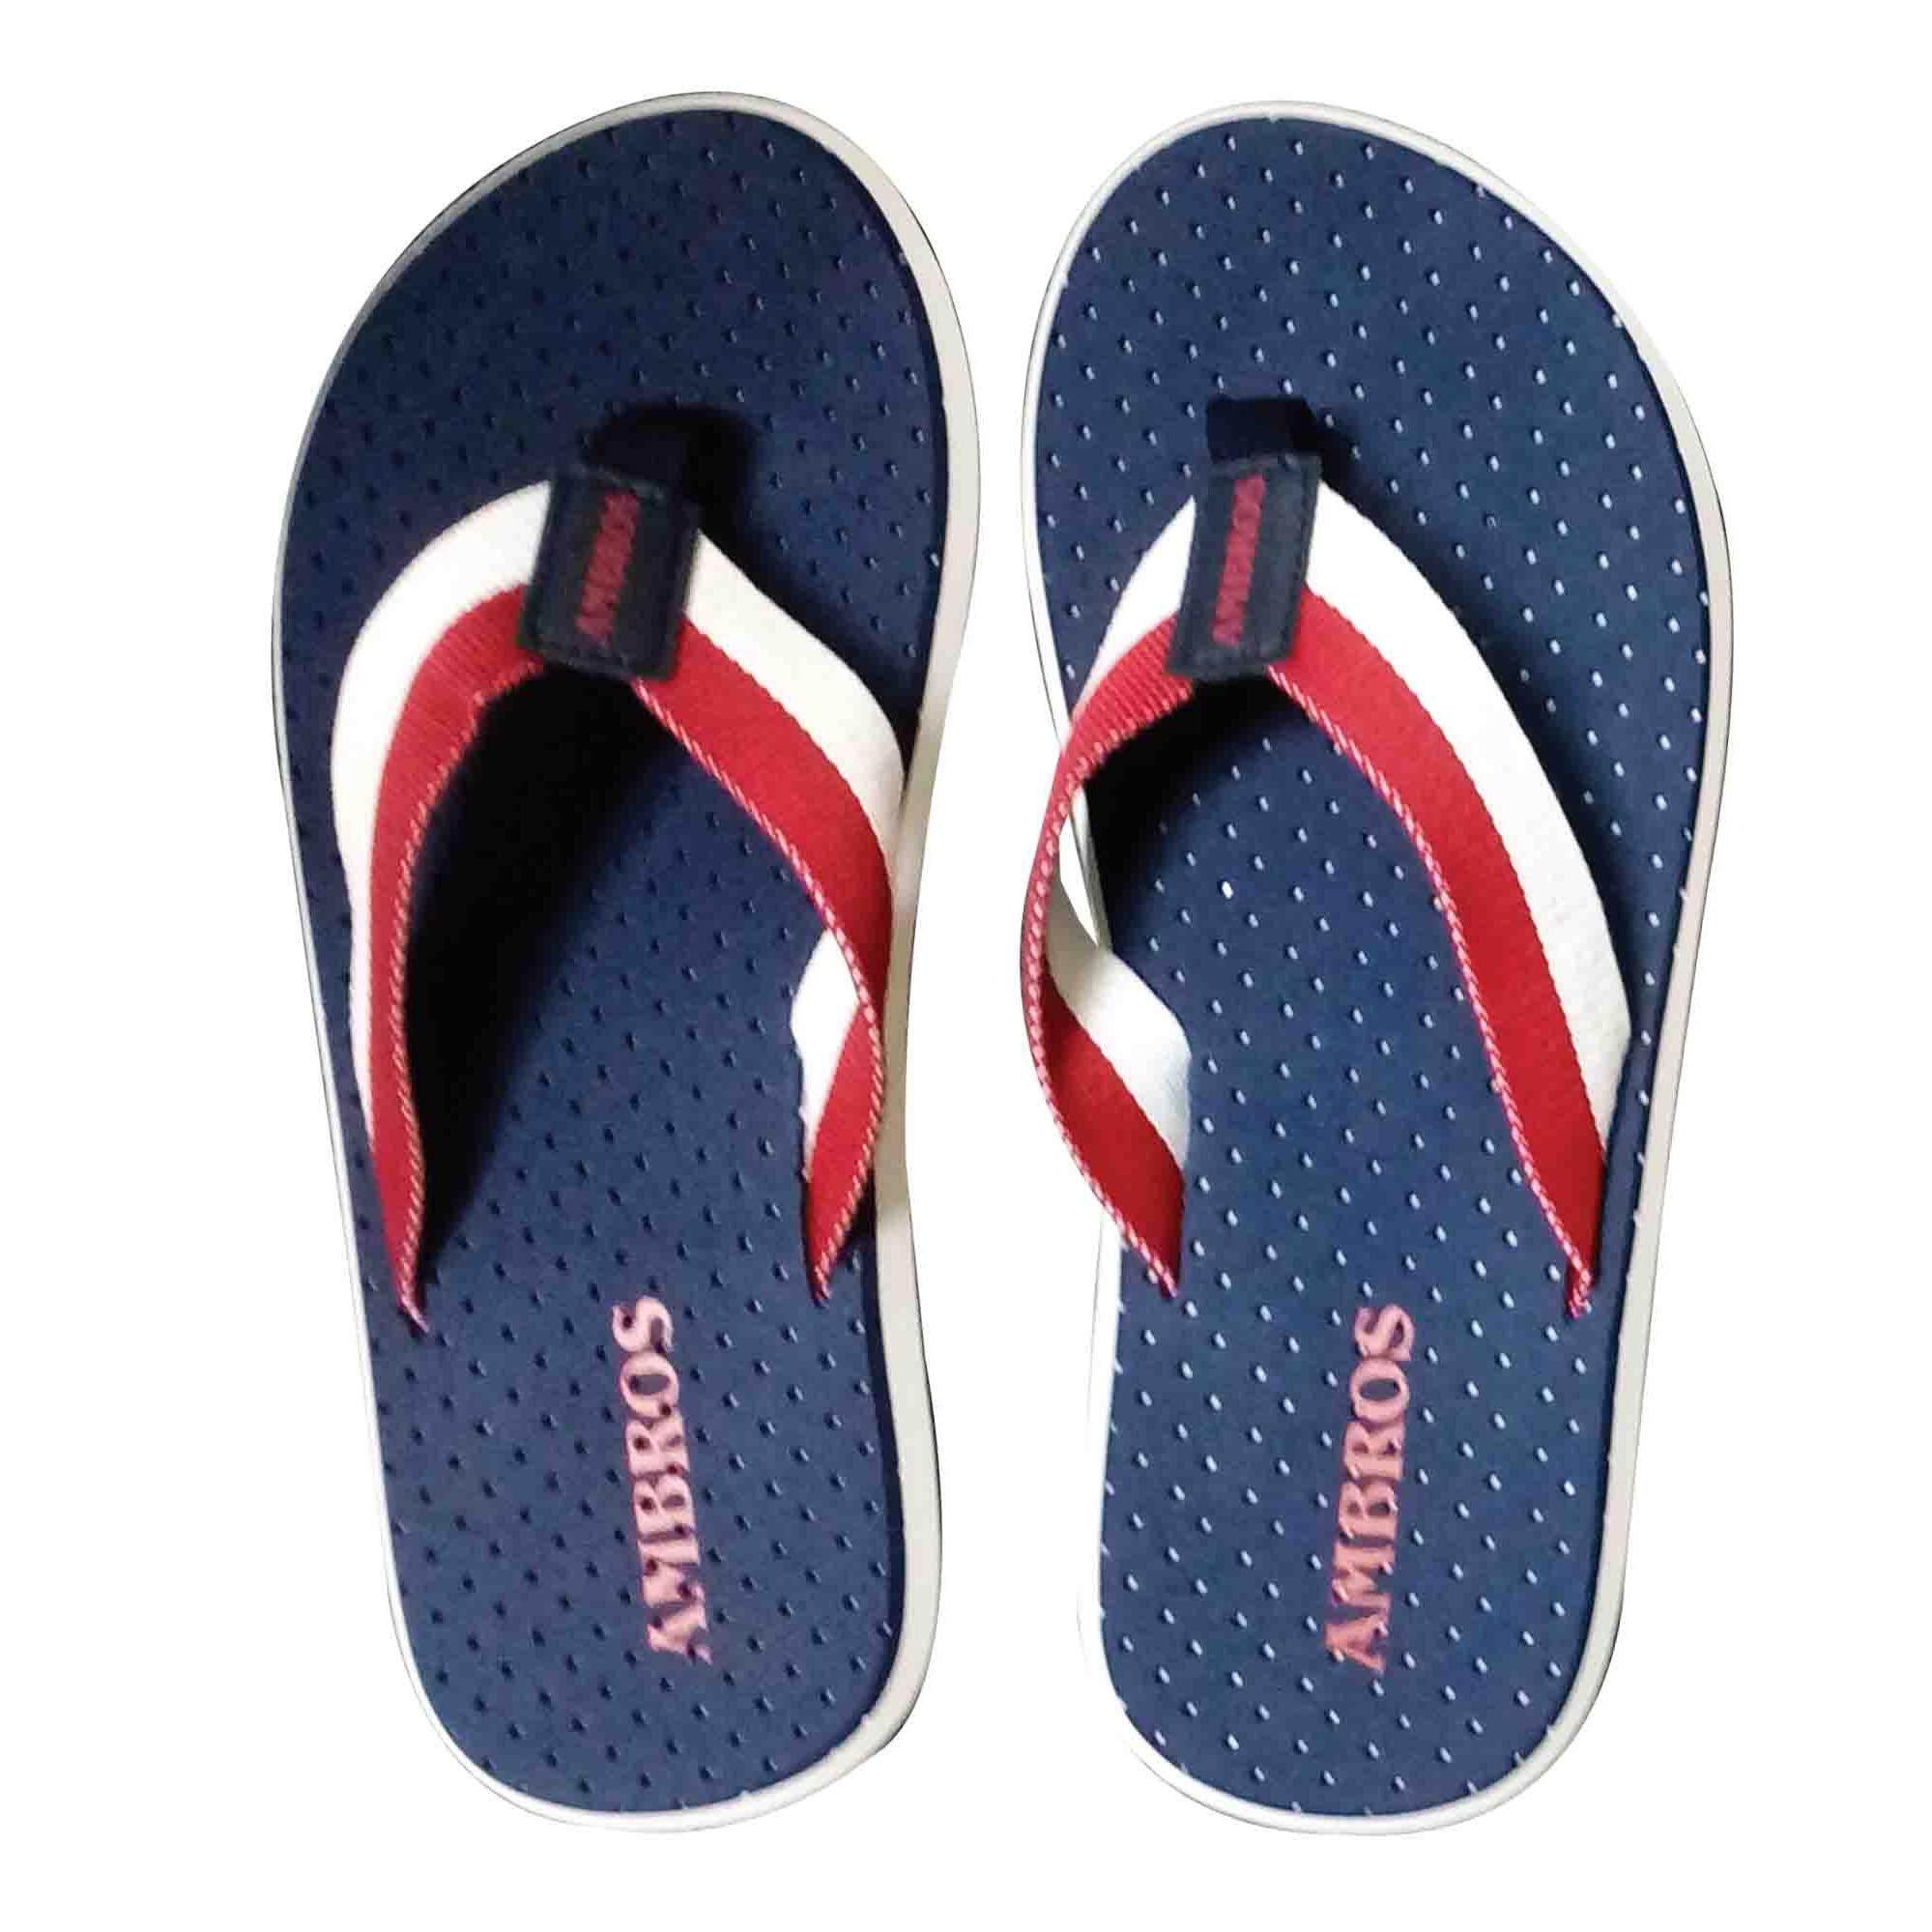 Ambros Ventilator Flip-Flop Sandals Slippers - Navy/Red